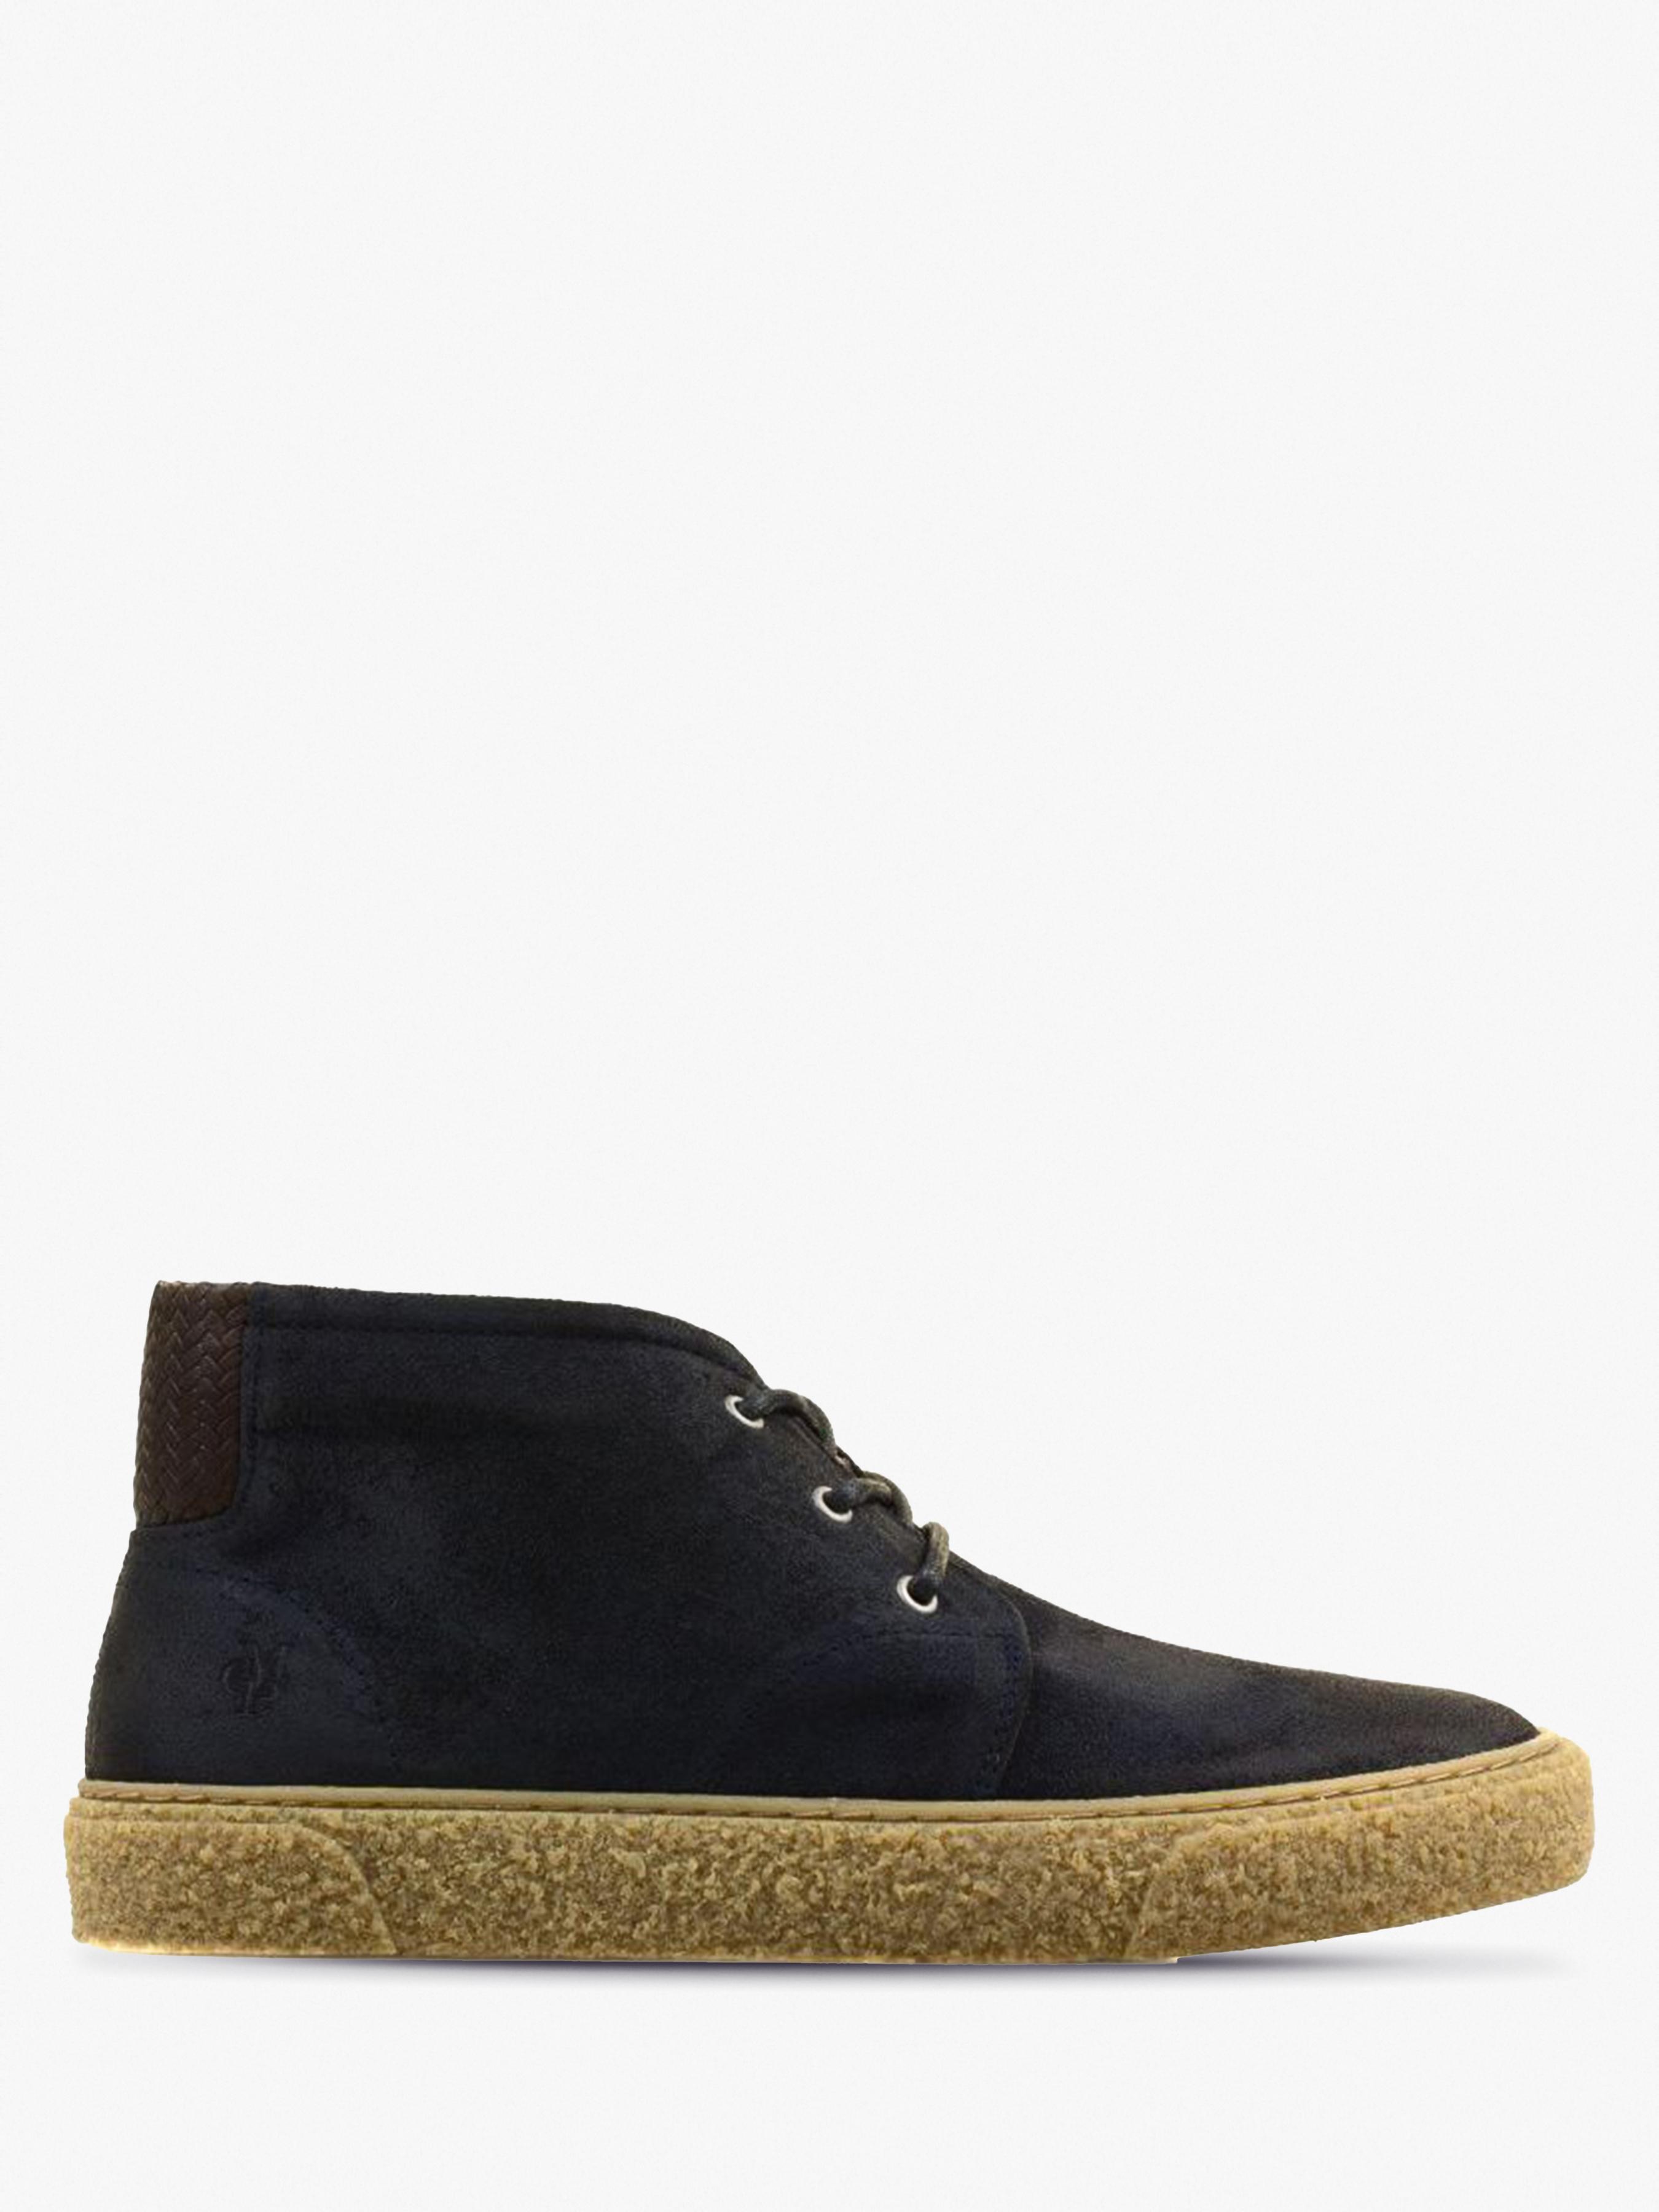 Купить Ботинки мужские MARC O'POLO PO317, Серый